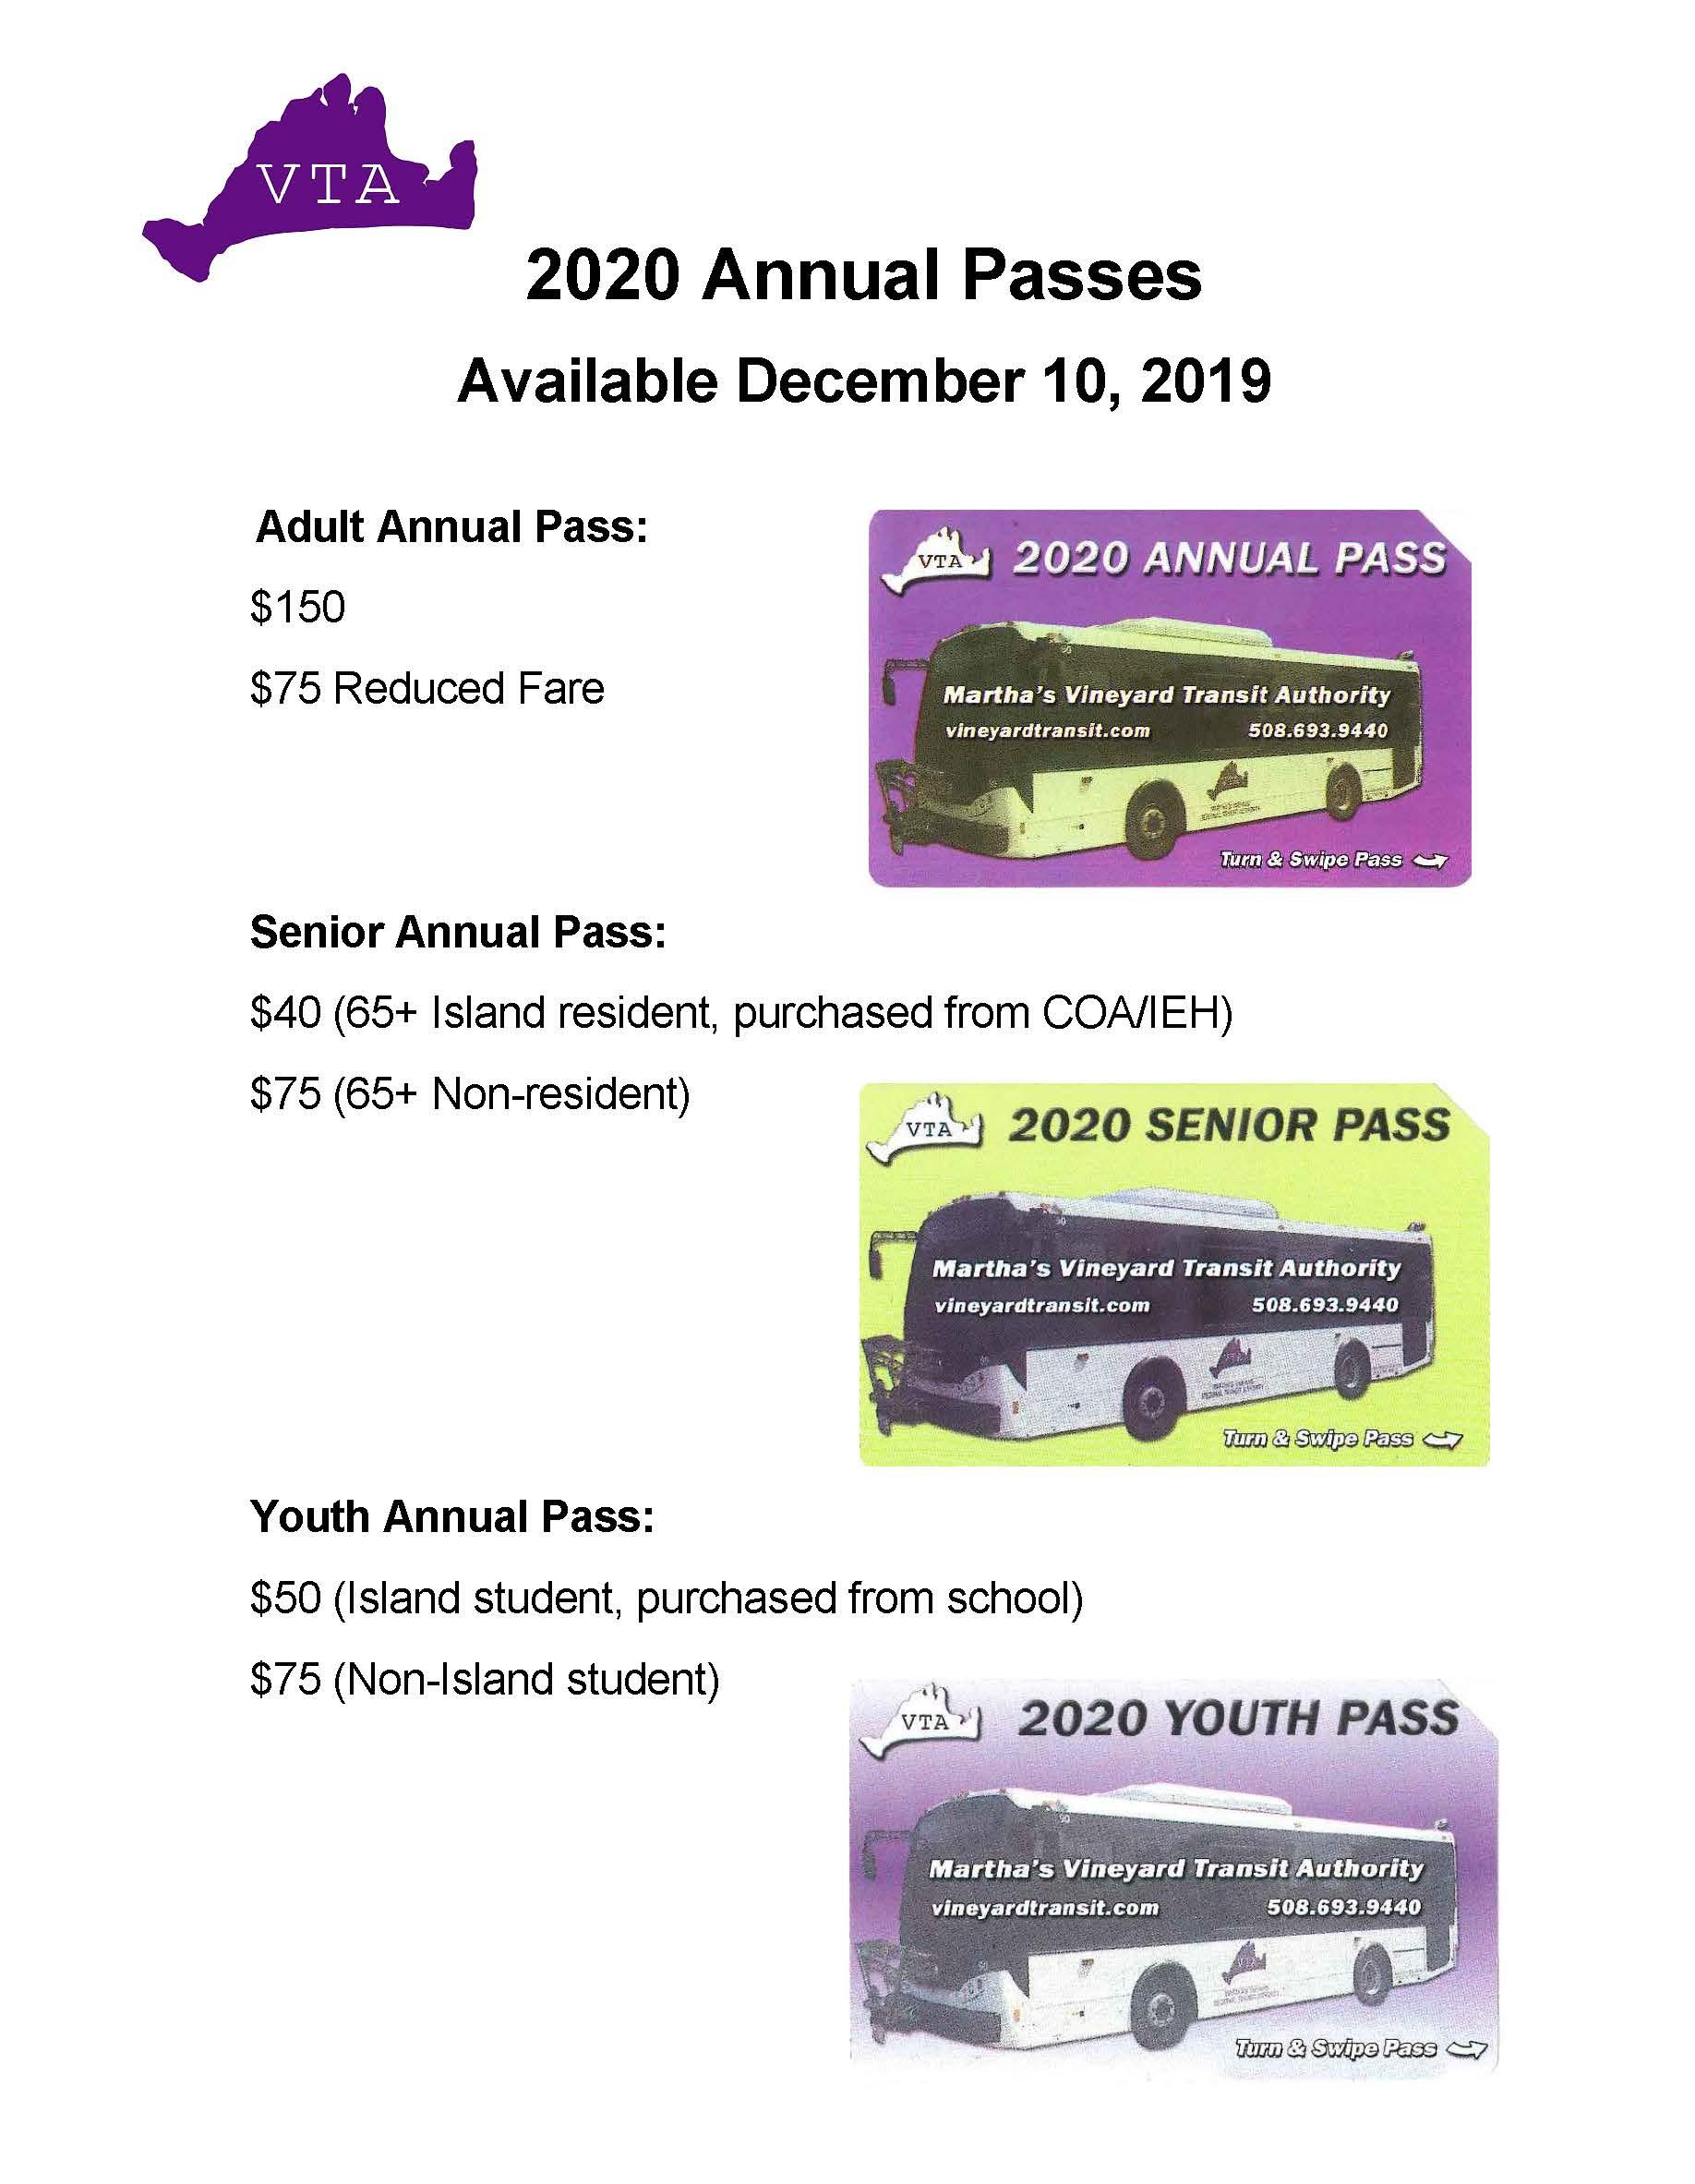 2020 Annual Pass